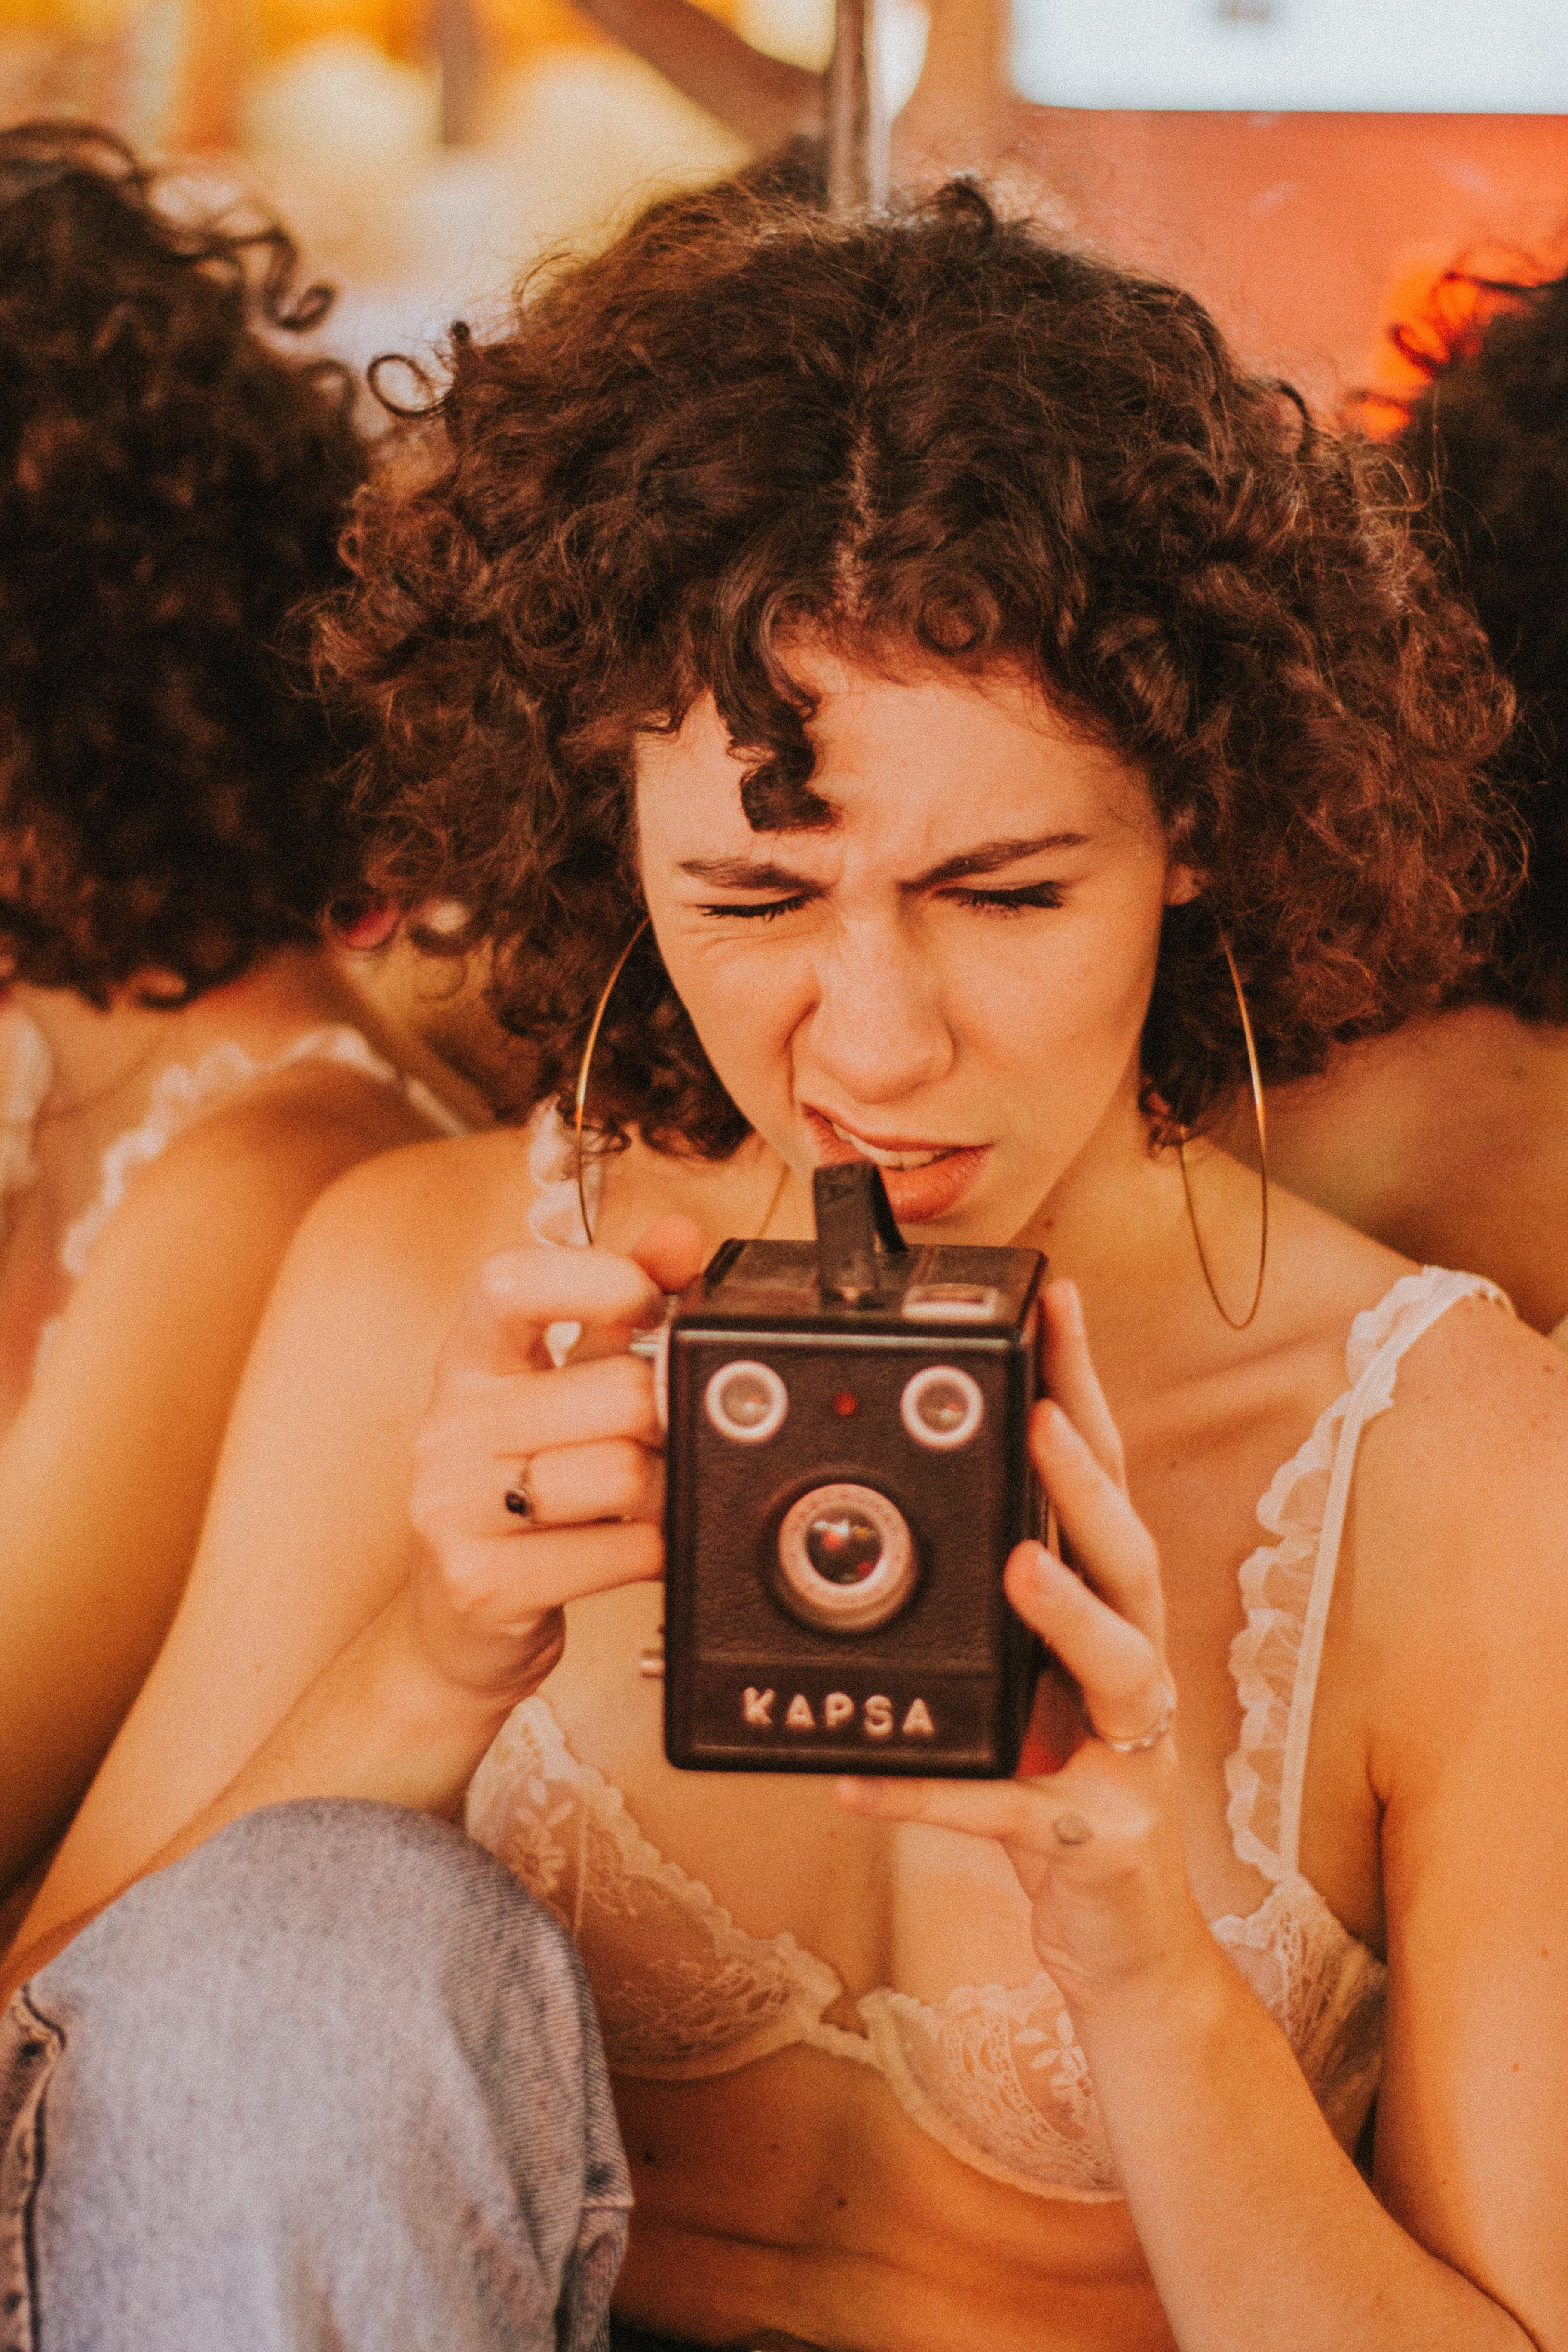 Woman Using Black Kapsa Camera